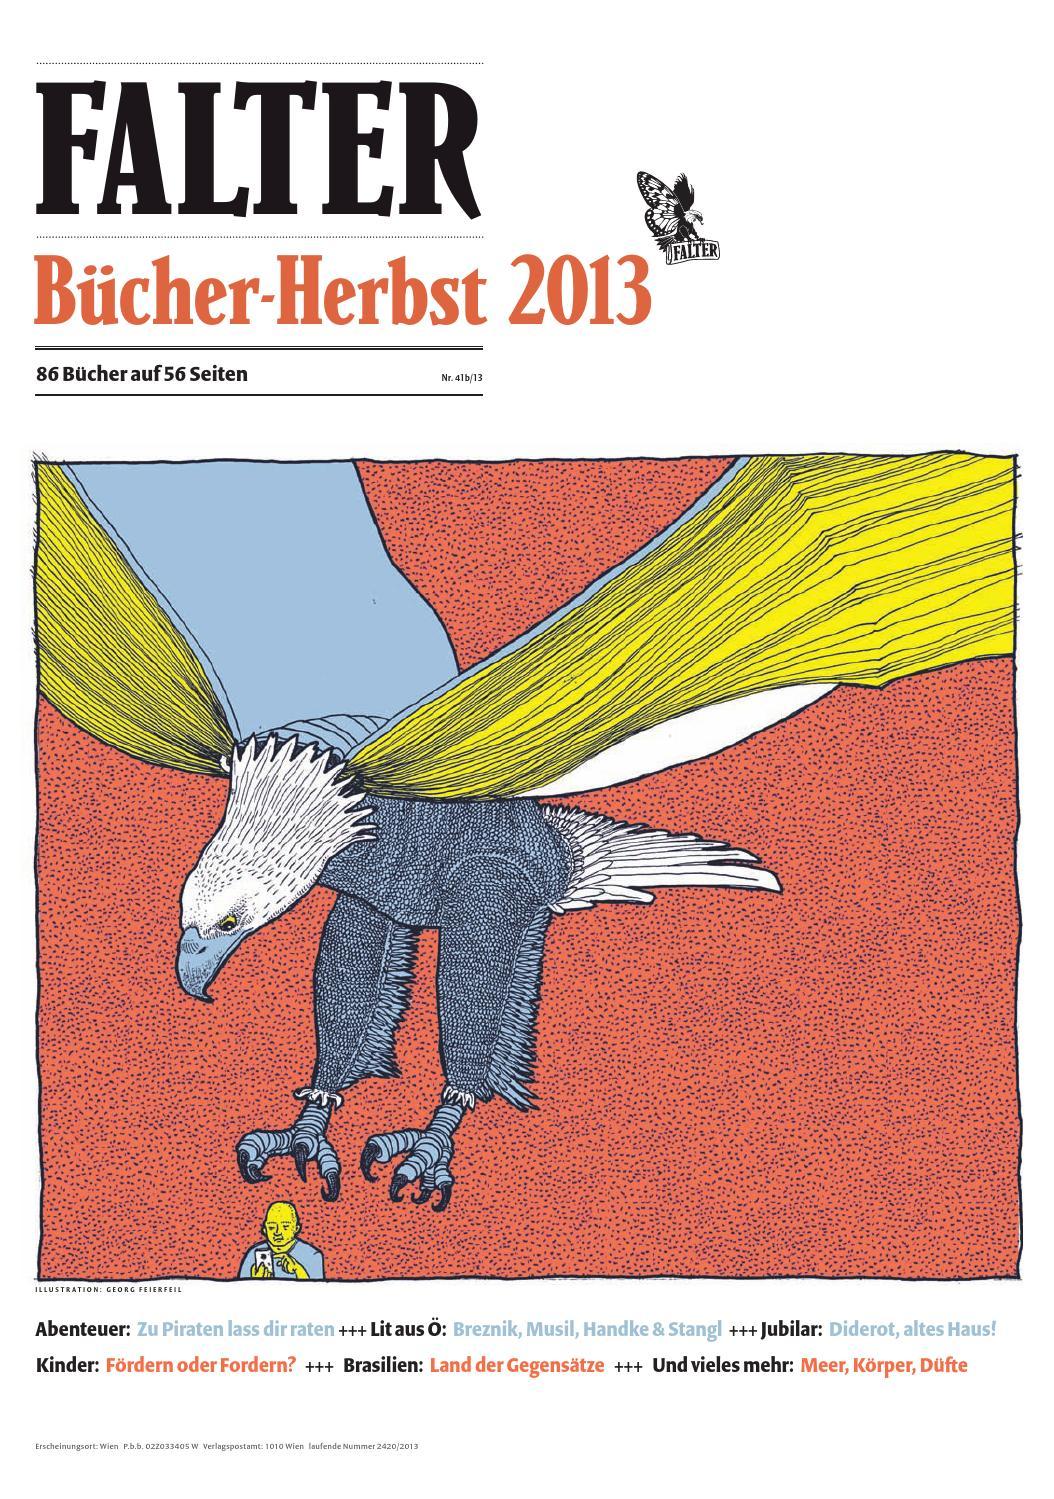 Bücher-Herbst 13 by Falter Verlagsgesellschaft m.b.H. - issuu